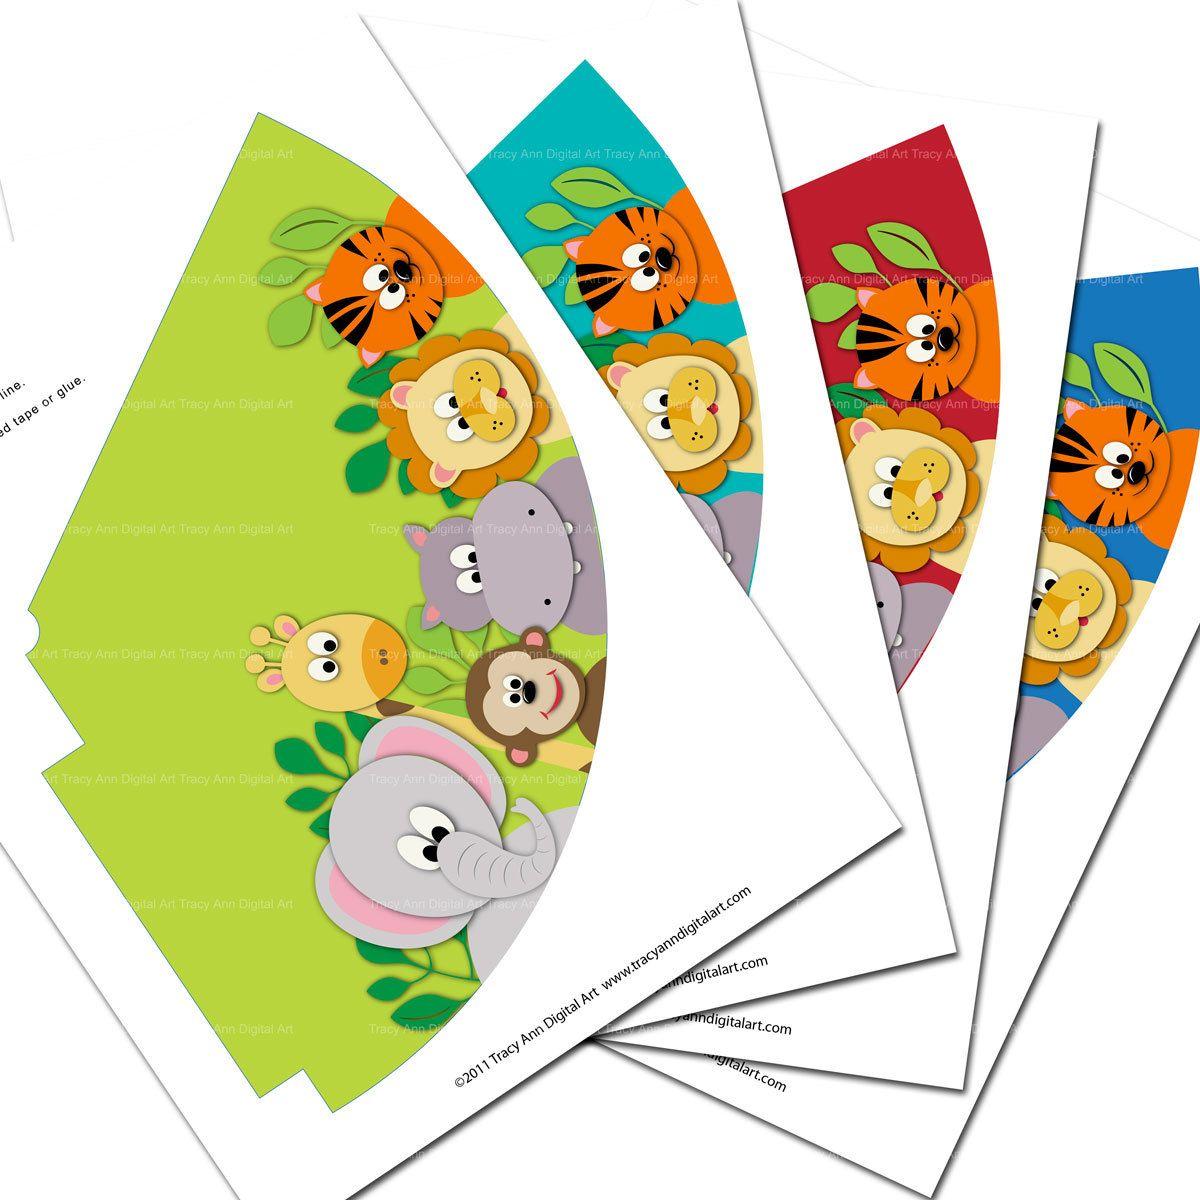 New Printable Jungle Party Hats Do It Yourself 3 95 Via Etsy 1st Birthday Hats Jungle Party Animal Theme Birthday